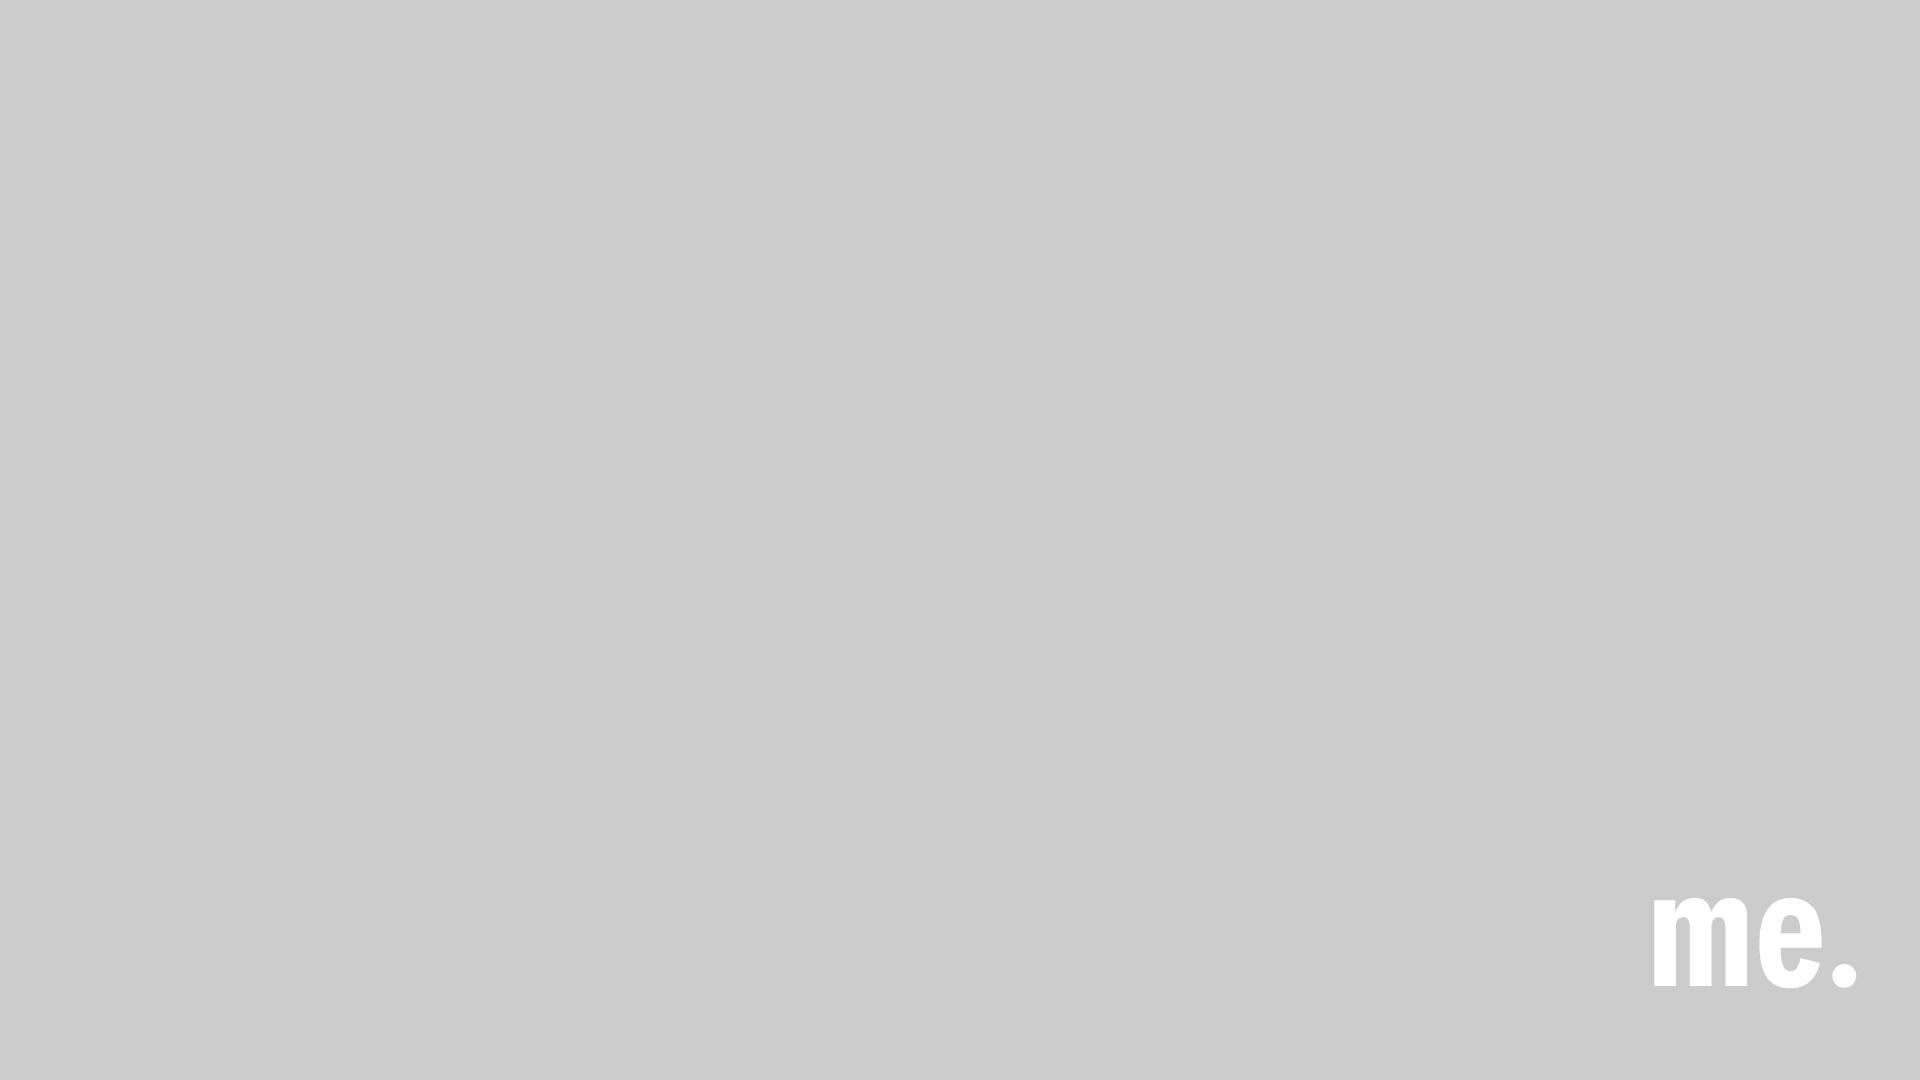 Ian McLagan ist am 3.Dezember 2014 verstorben